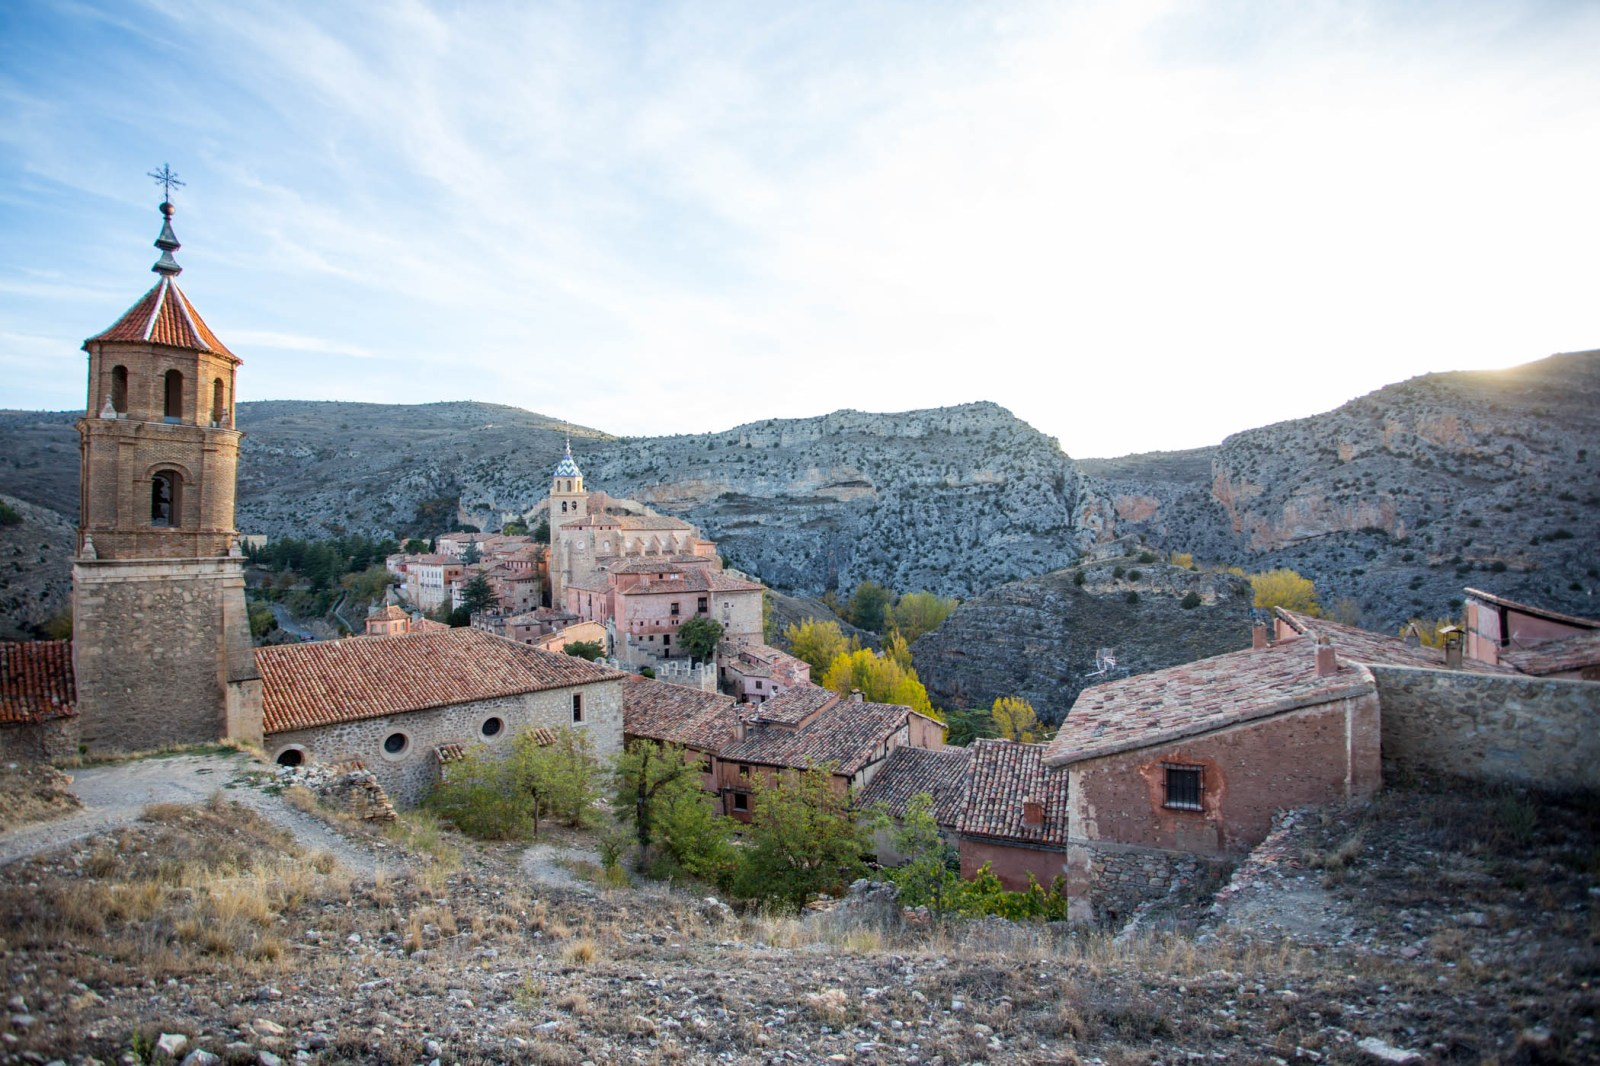 Sandstone Guesthouse in Albarracin